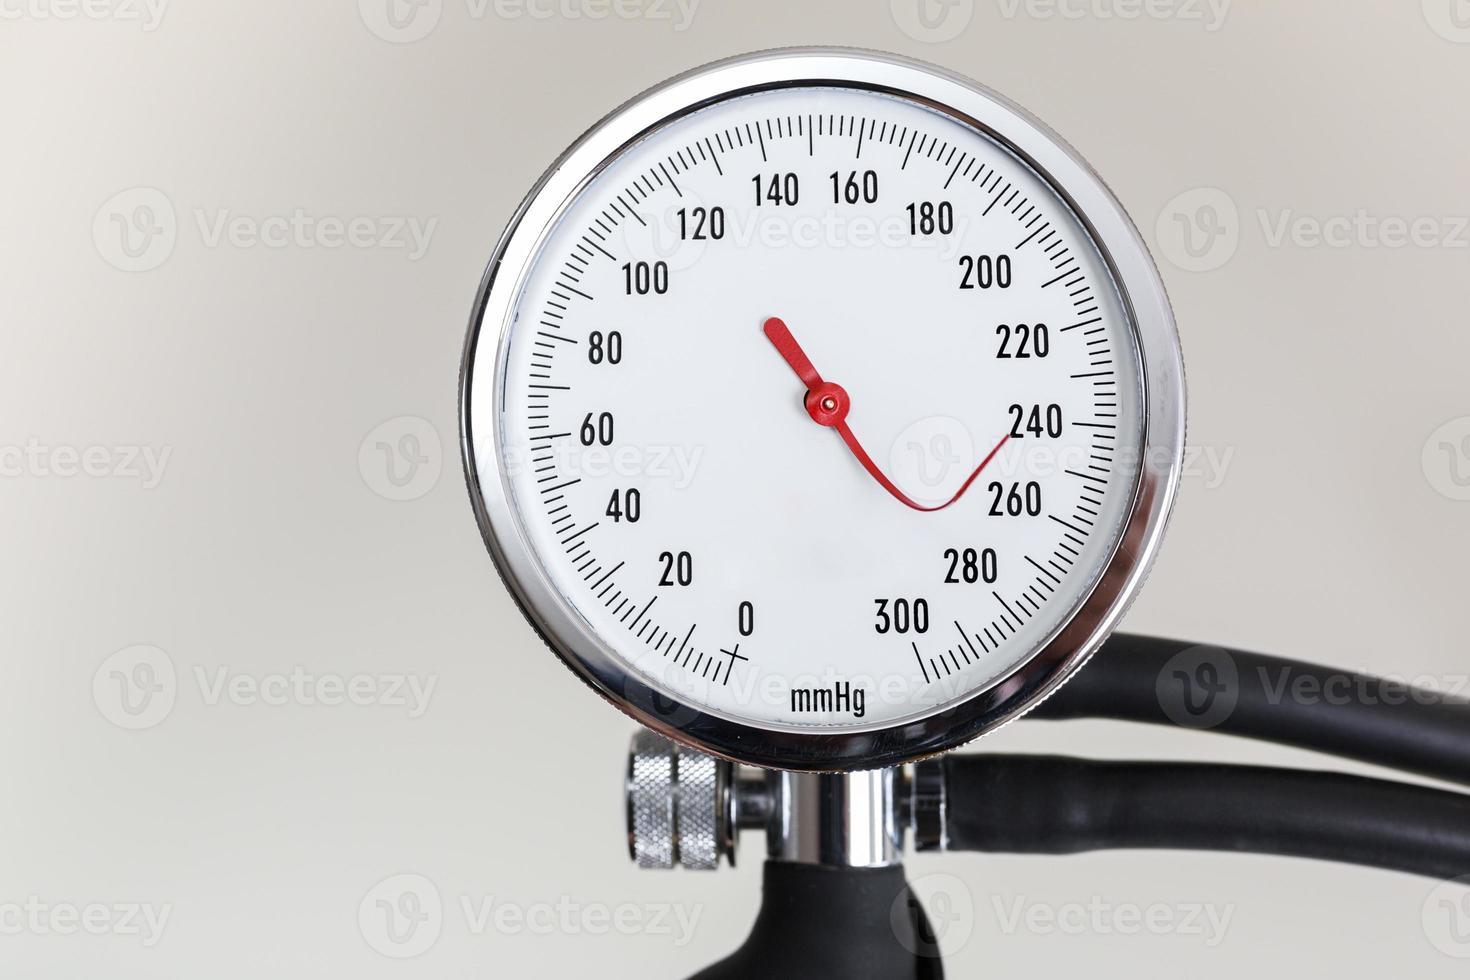 medidor de presión arterial con aguja indicadora doblada foto